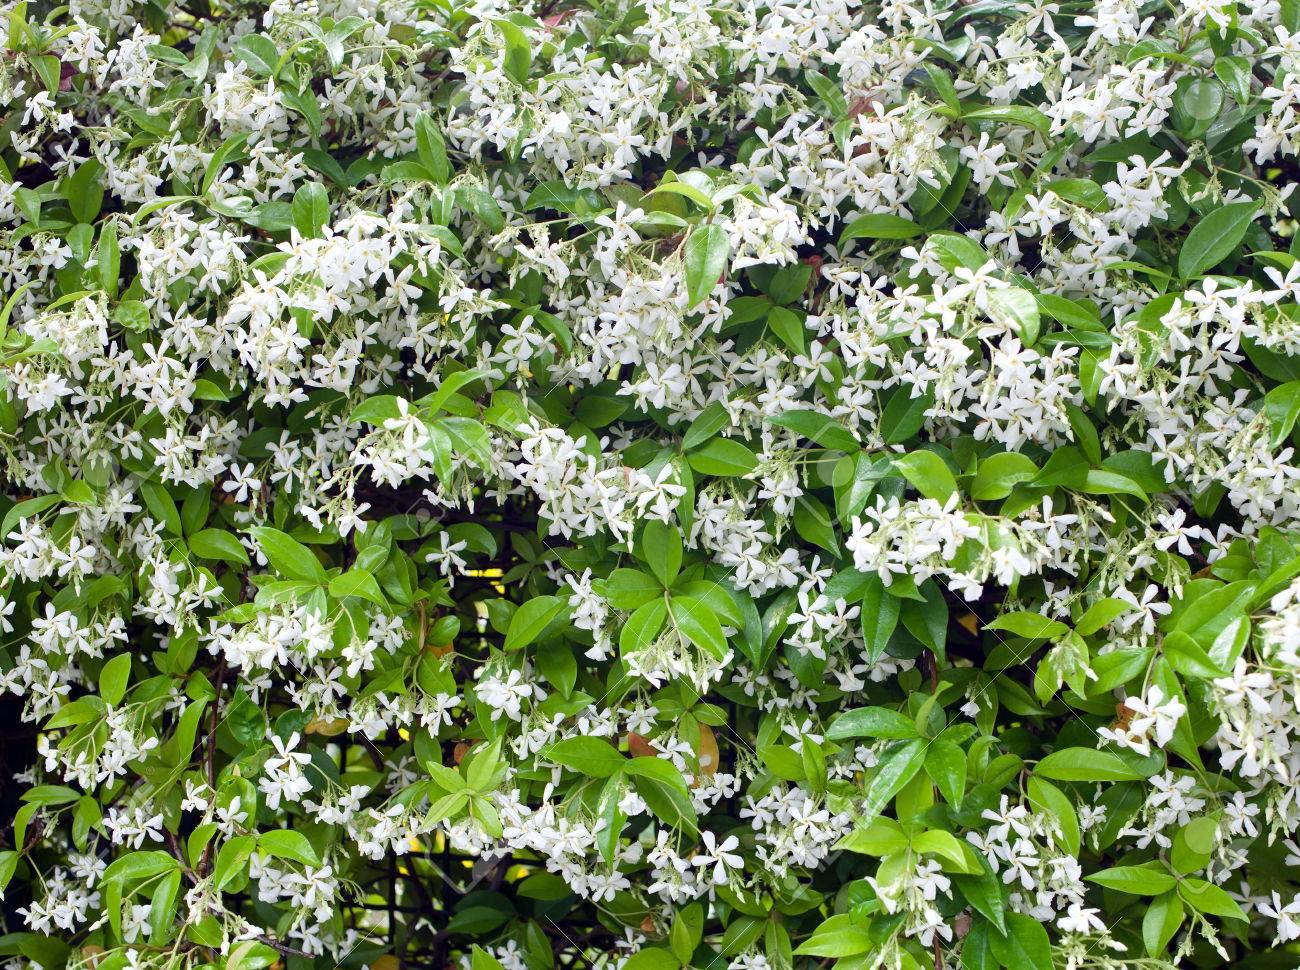 Group of white sampaguita jasmine or arabian jasmine flower stock group of white sampaguita jasmine or arabian jasmine flower stock photo 29450844 izmirmasajfo